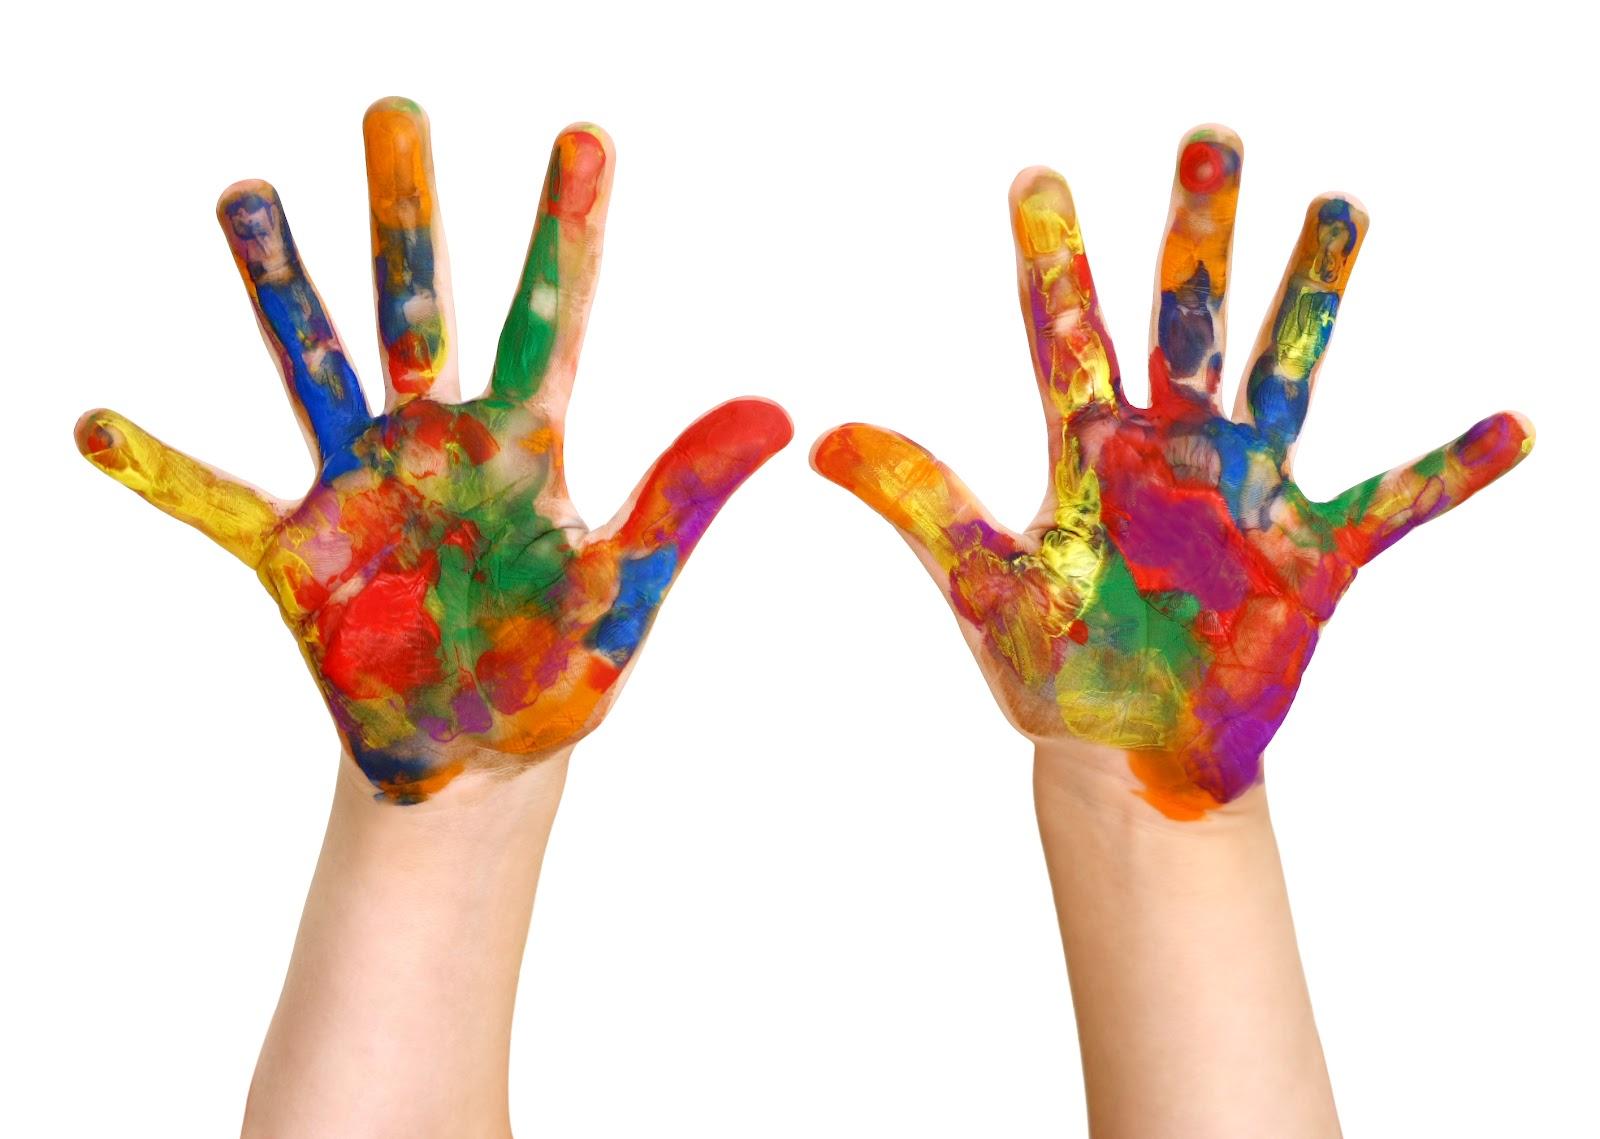 Free Download: Kids Painting